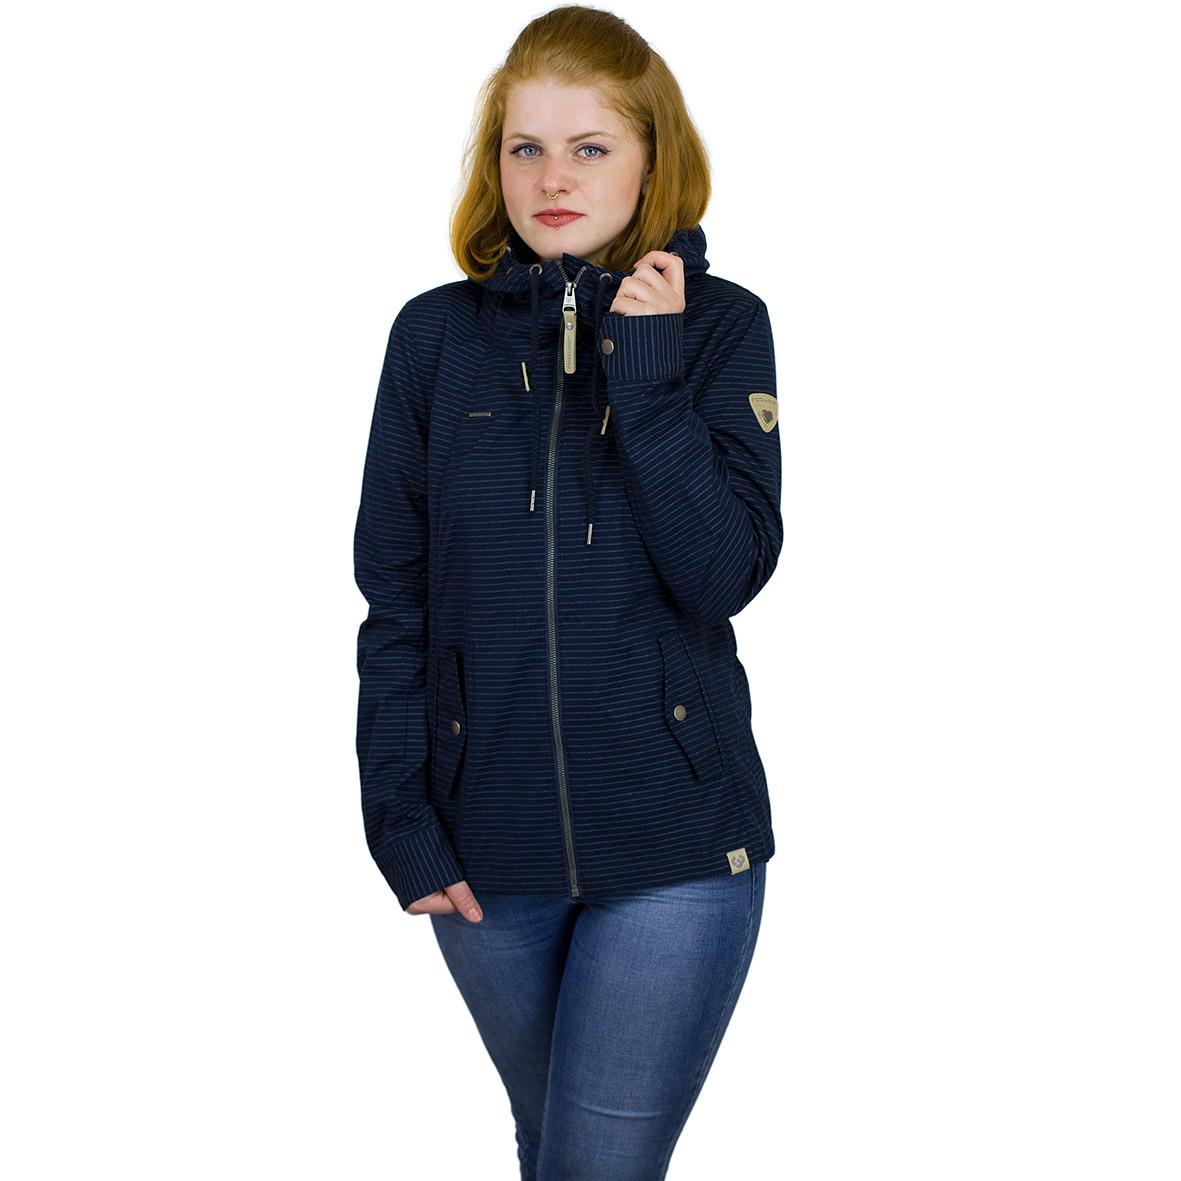 low priced ca9a0 90656 Ragwear Damen-Jacke Monade Stripes dunkelblau